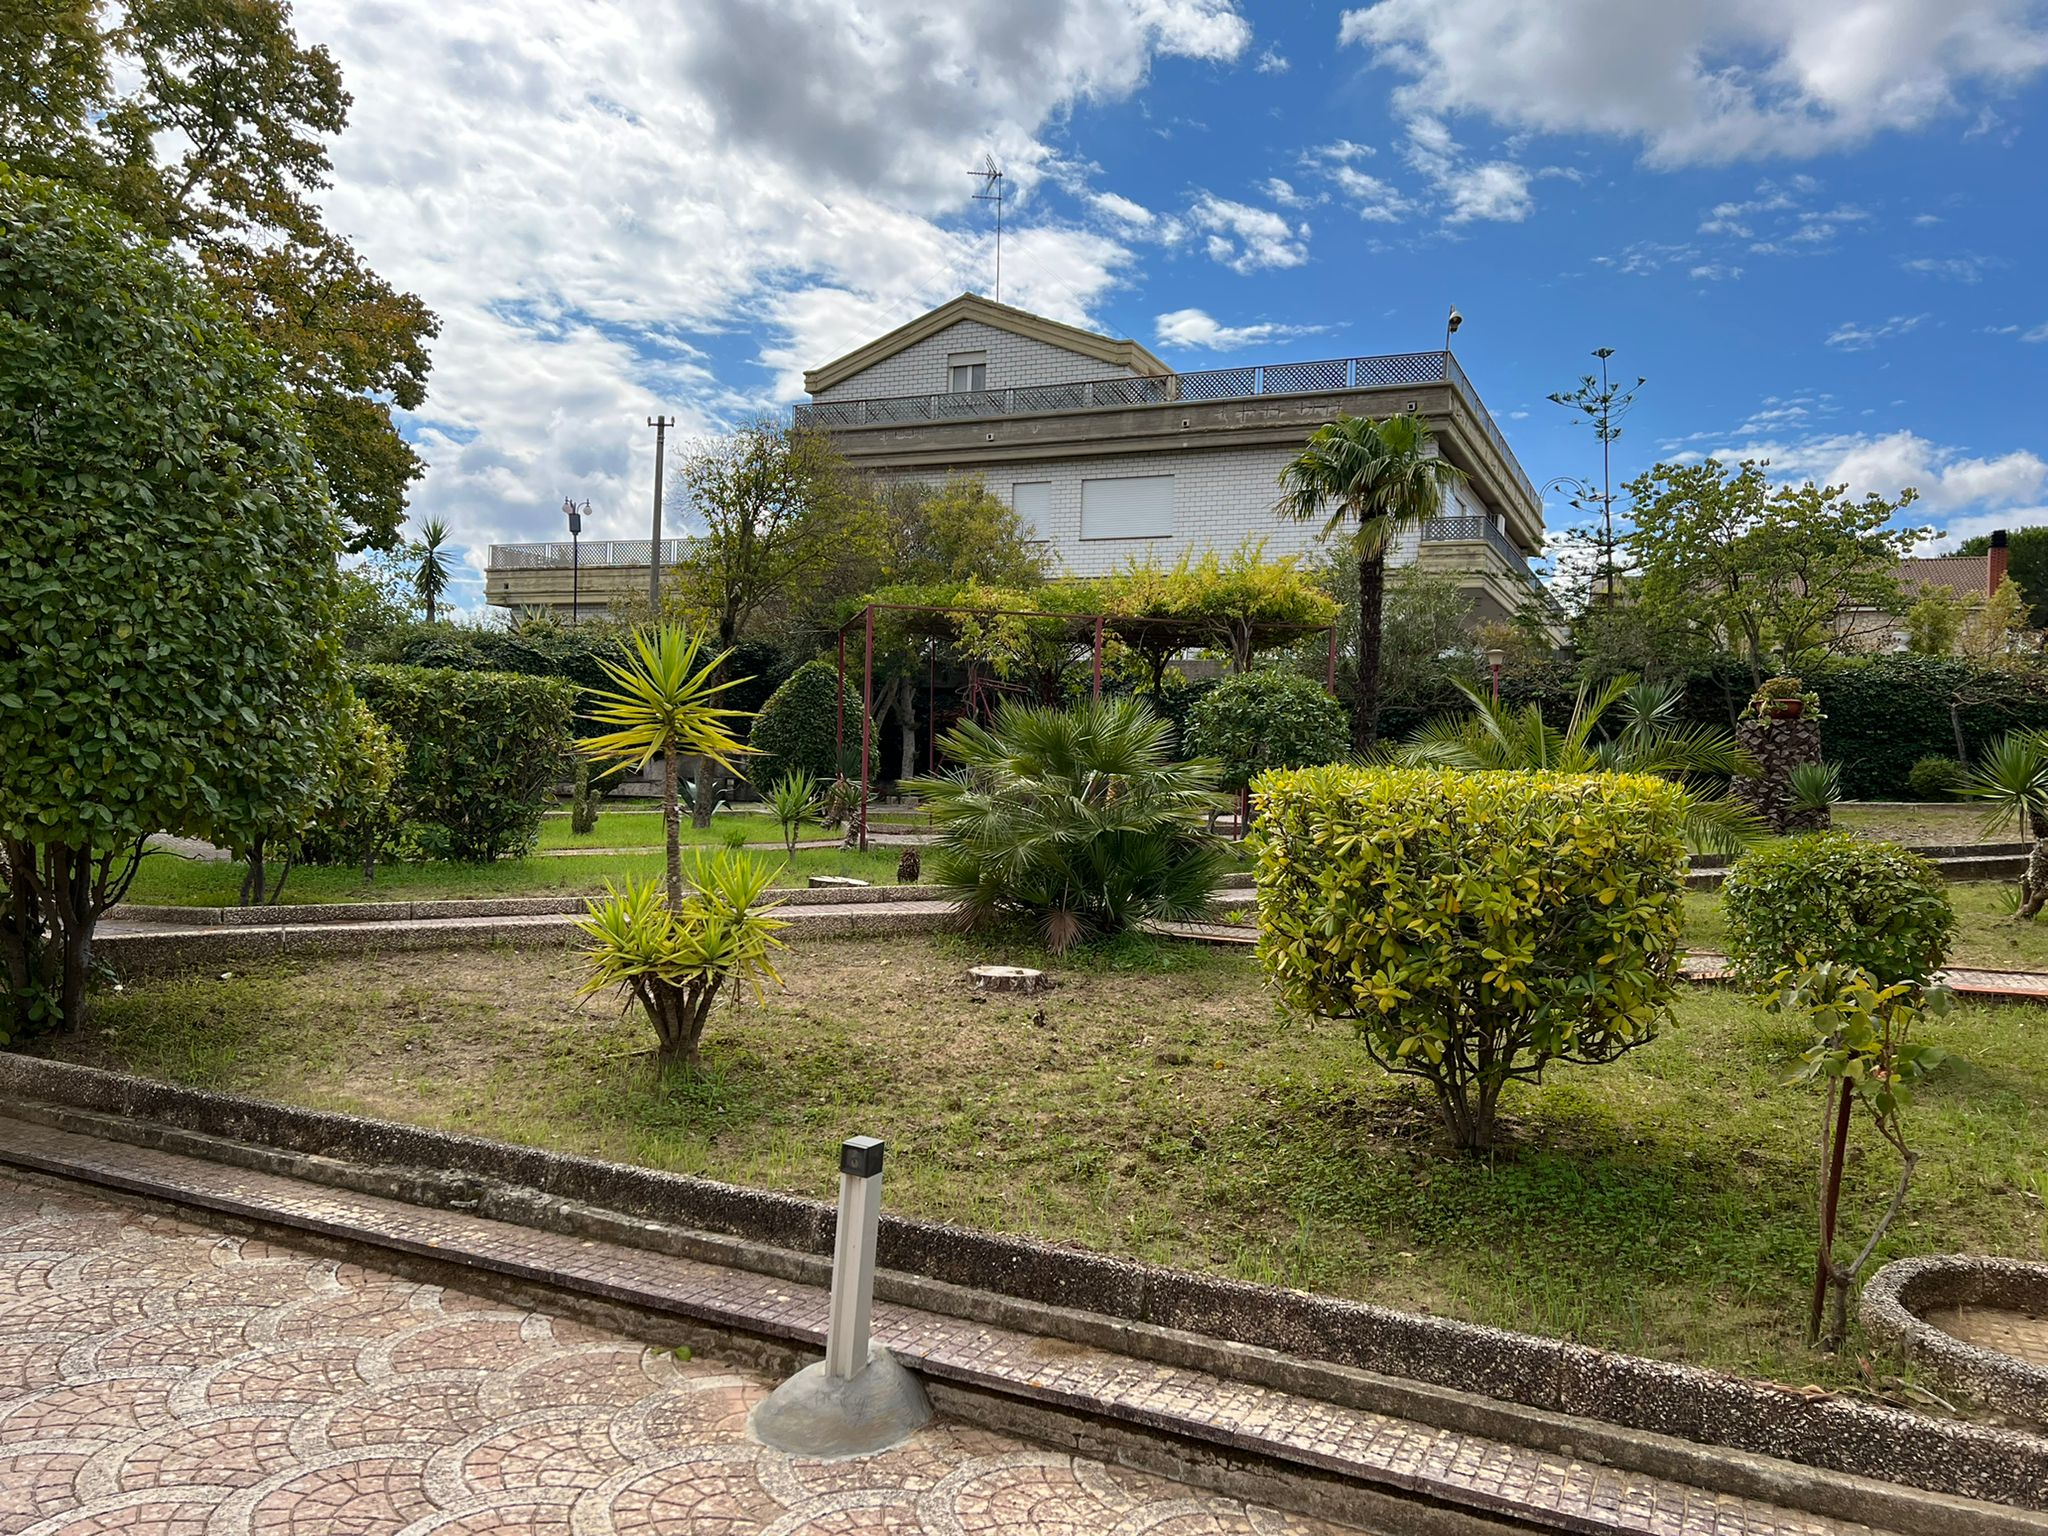 villa cembalo